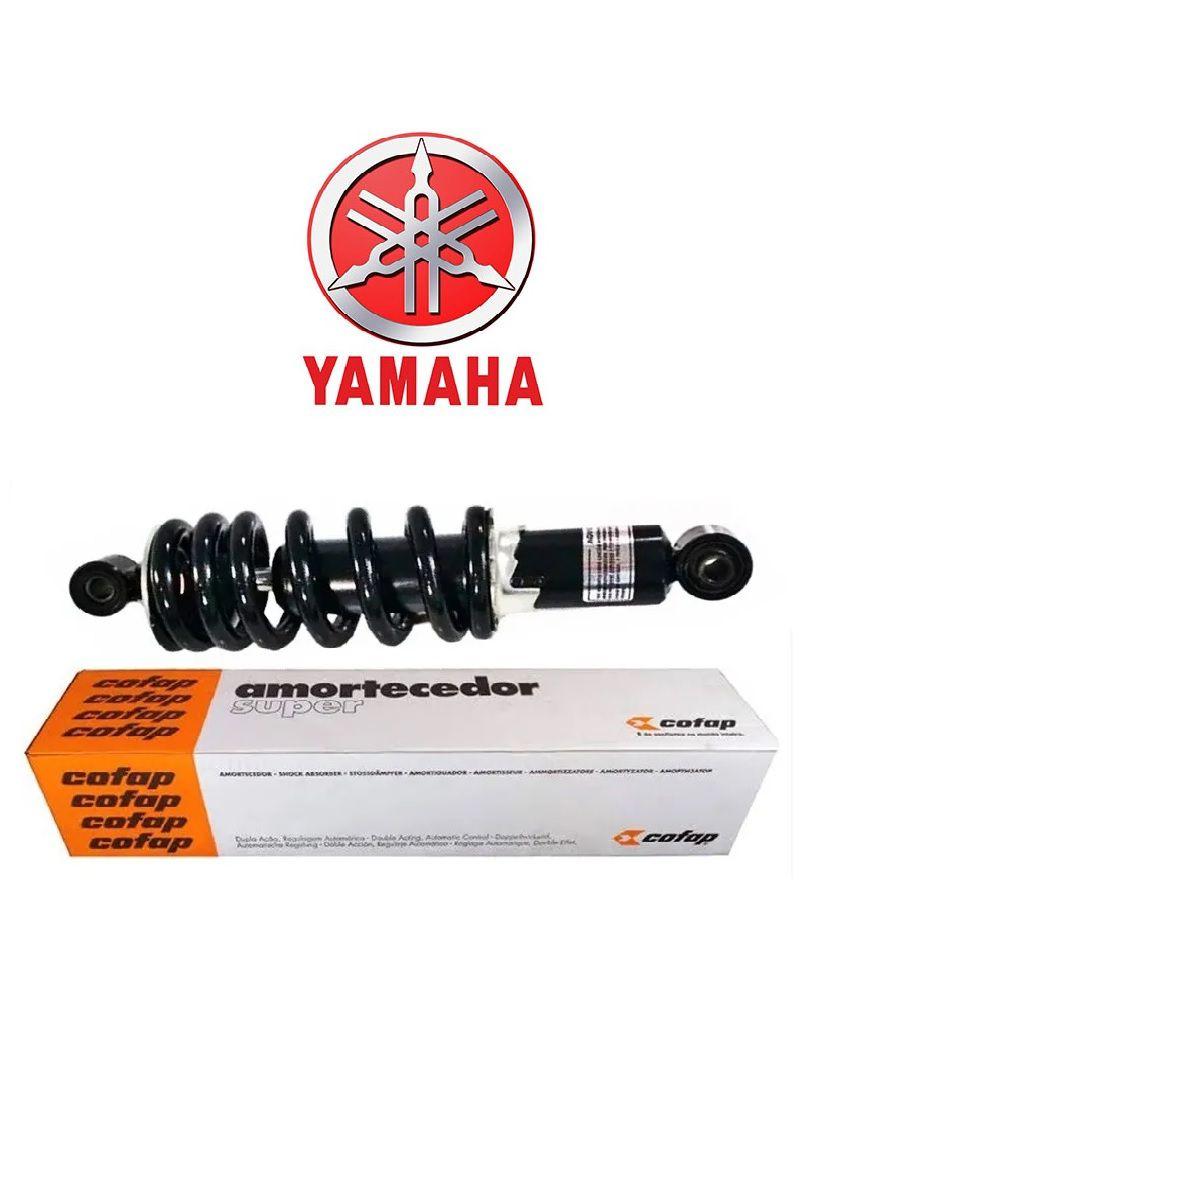 Amortecedor Yamaha Lander 250 Tenere Cofap Original